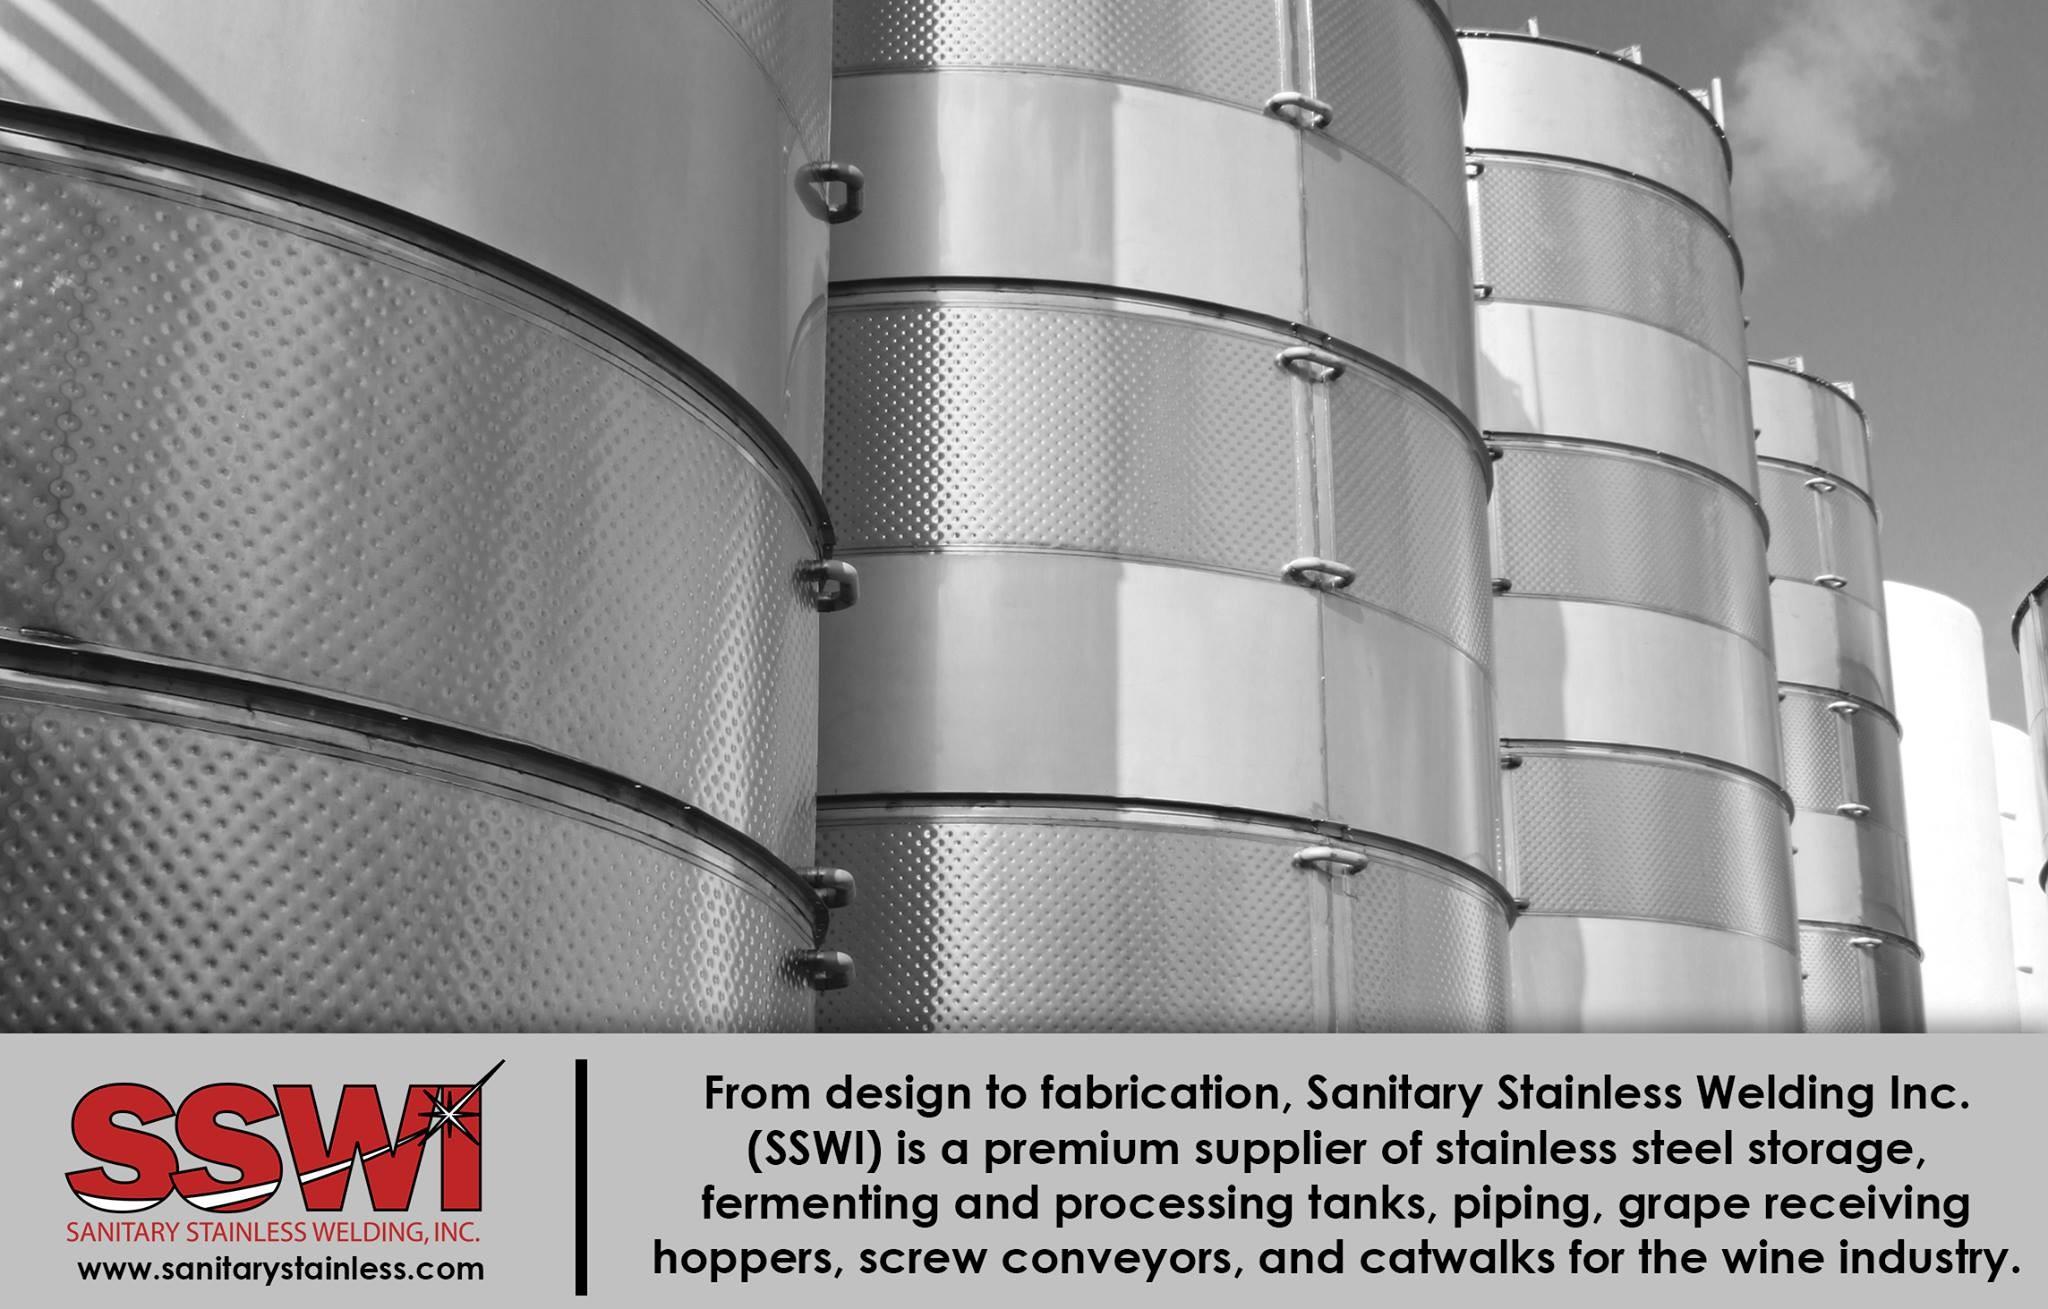 Sanitary Stainless Welding, Inc  - SSWI | LinkedIn